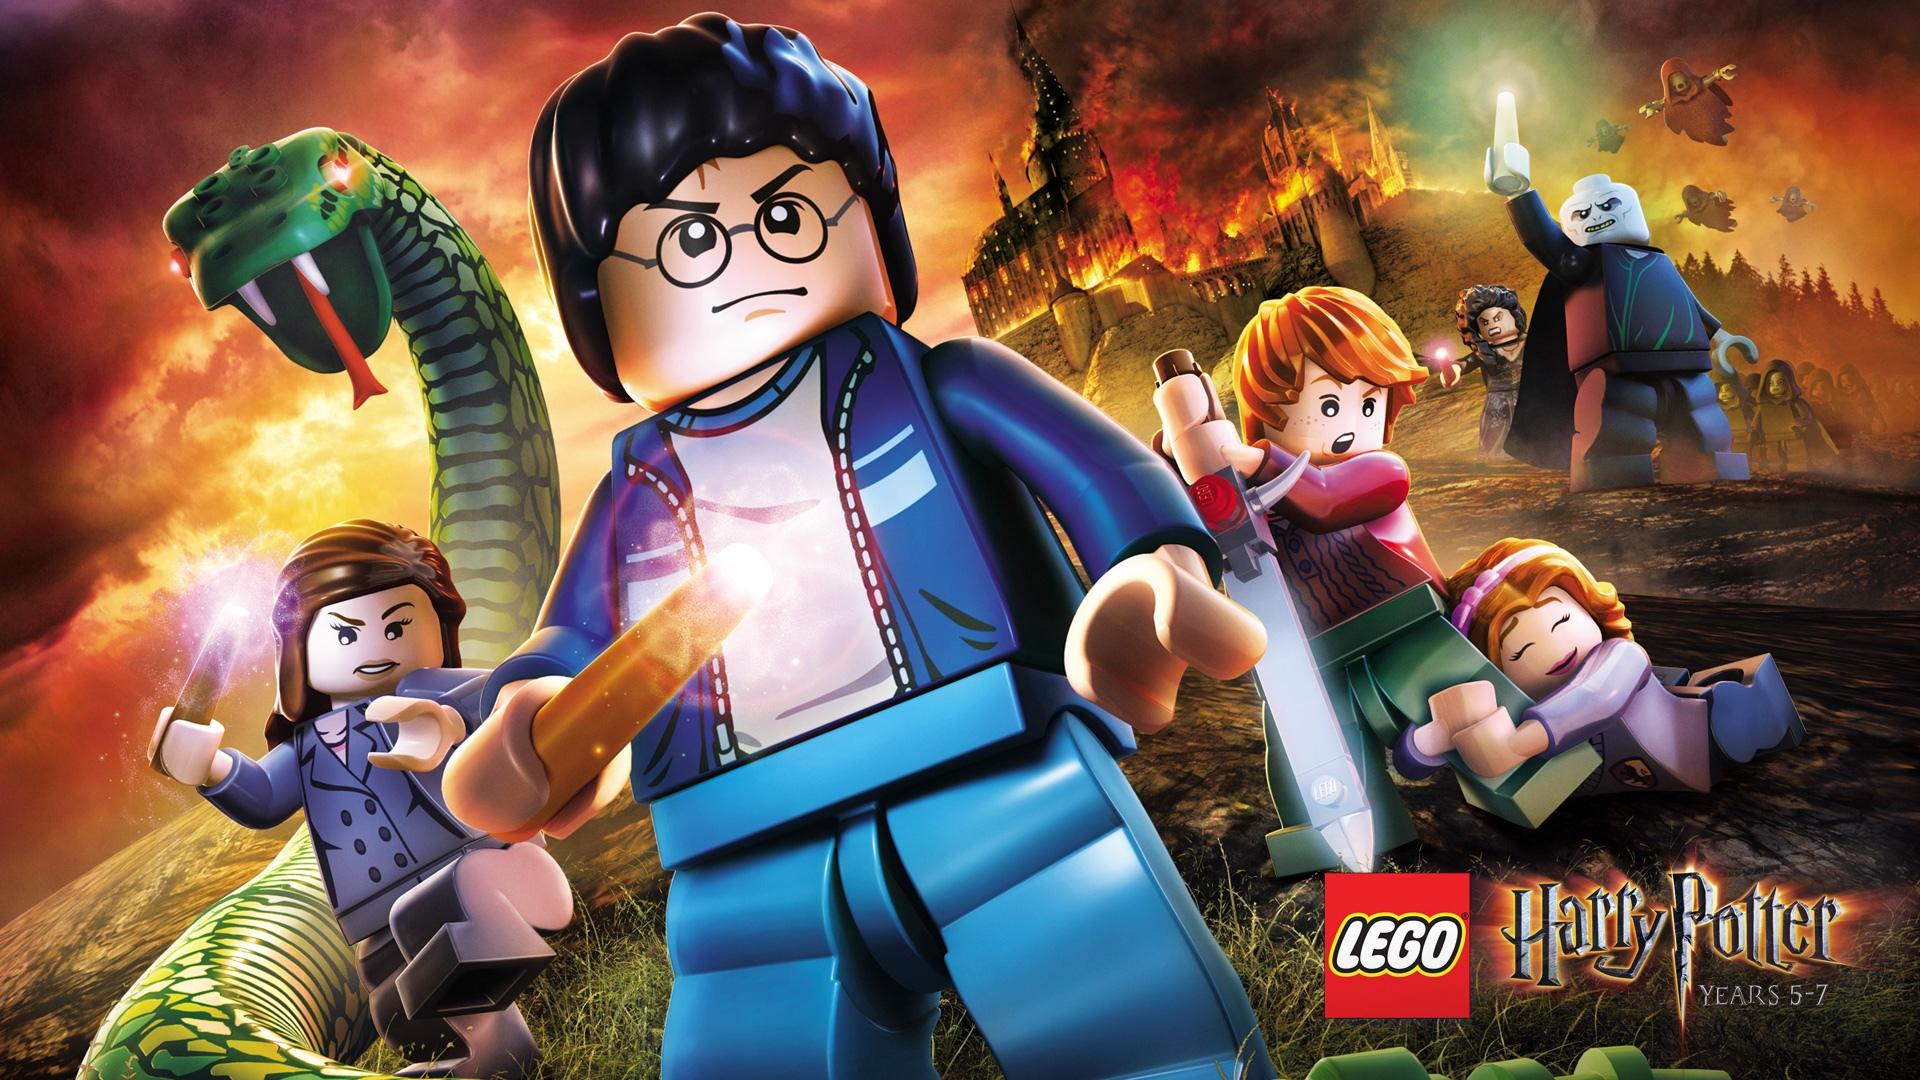 Lego Harry Potter: Years 5-7 (2011) [Region Free][Eng][Lt 2.0][L]